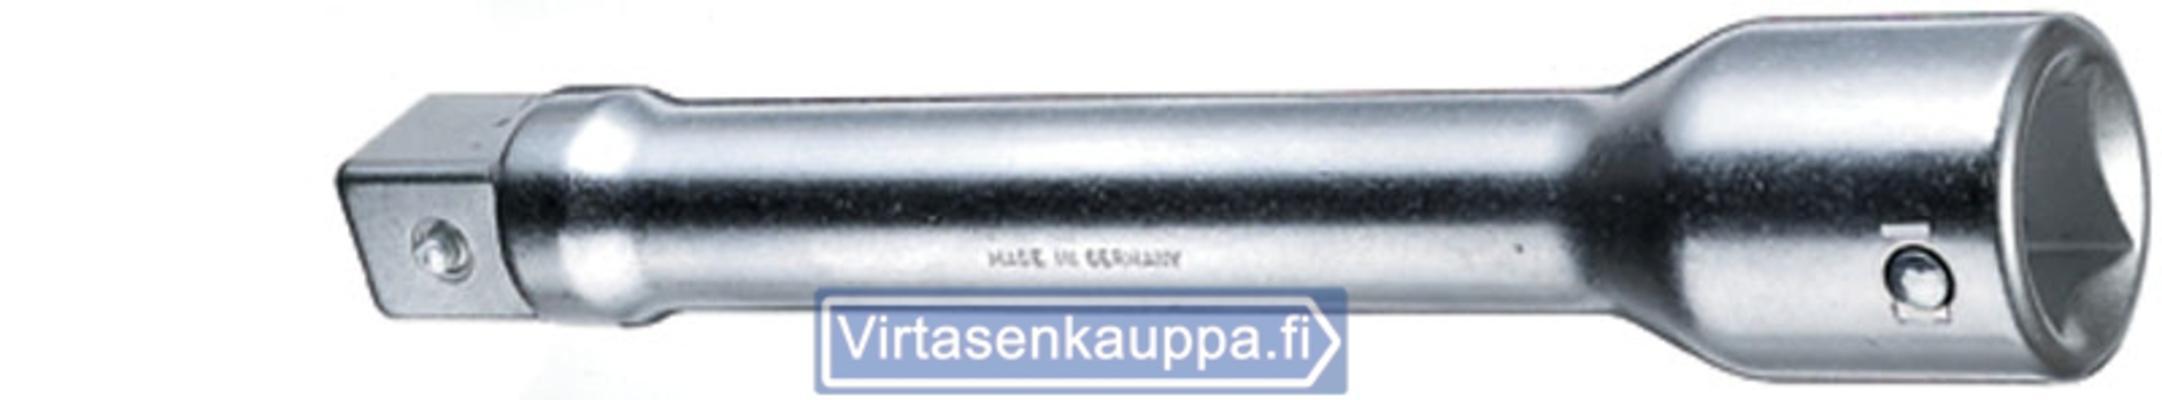 "Jatkovarsi 3/4"", Stahlwille 559 - Koko 4, pituus 95 mm"